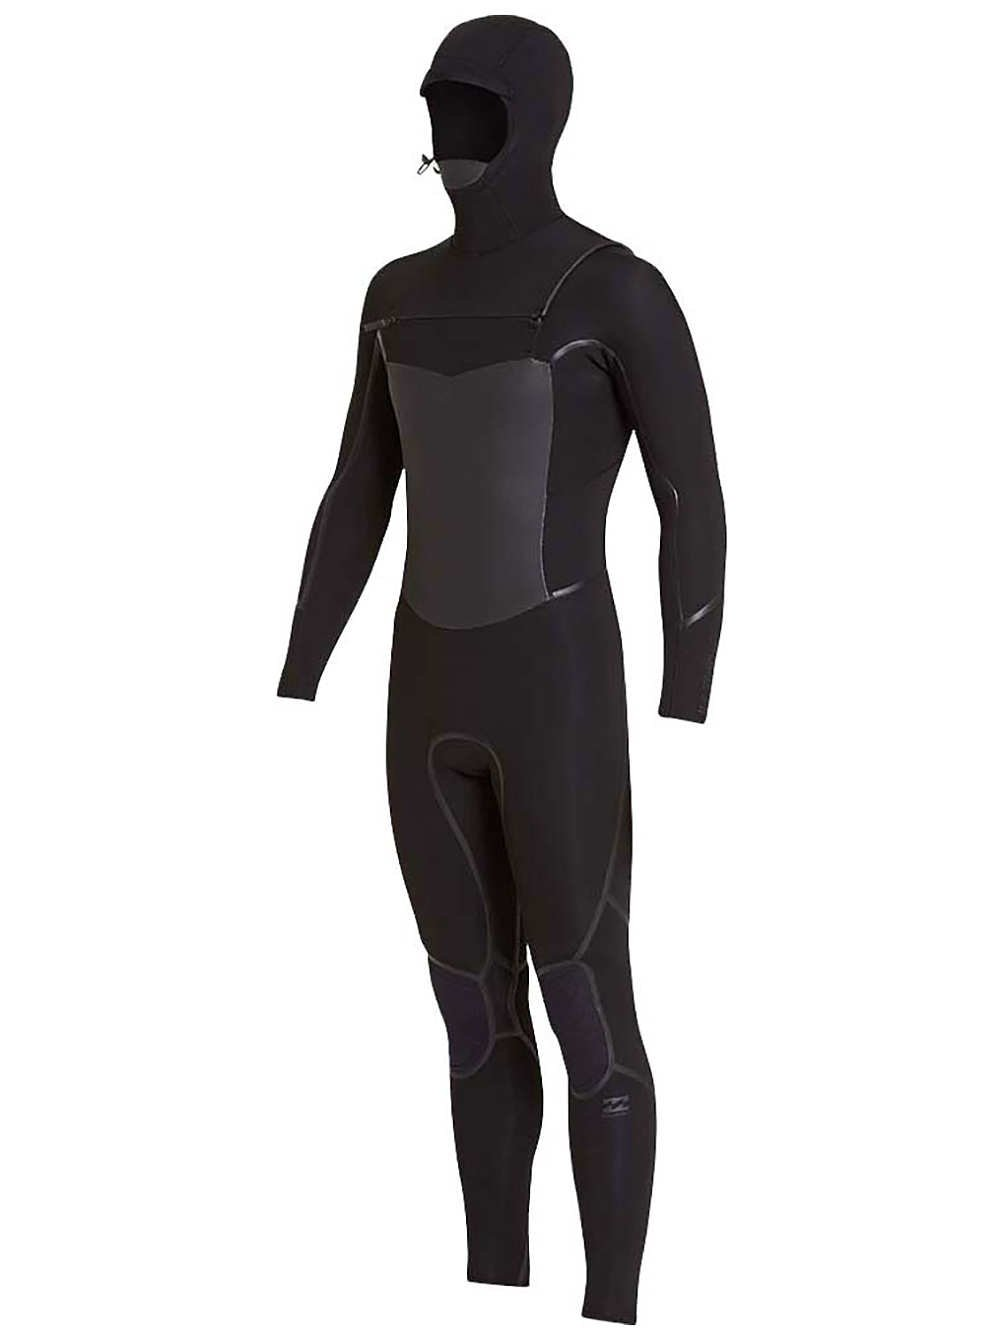 BILLABONG Furnace Absolute X Hooded Hooded Hooded 5   4MM Winterkälte Brust Zip Neoprenanzug Schwarz - Easy Stretch Thermoofenfutter B07CQGFMYV Neoprenanzüge Online a77d1b